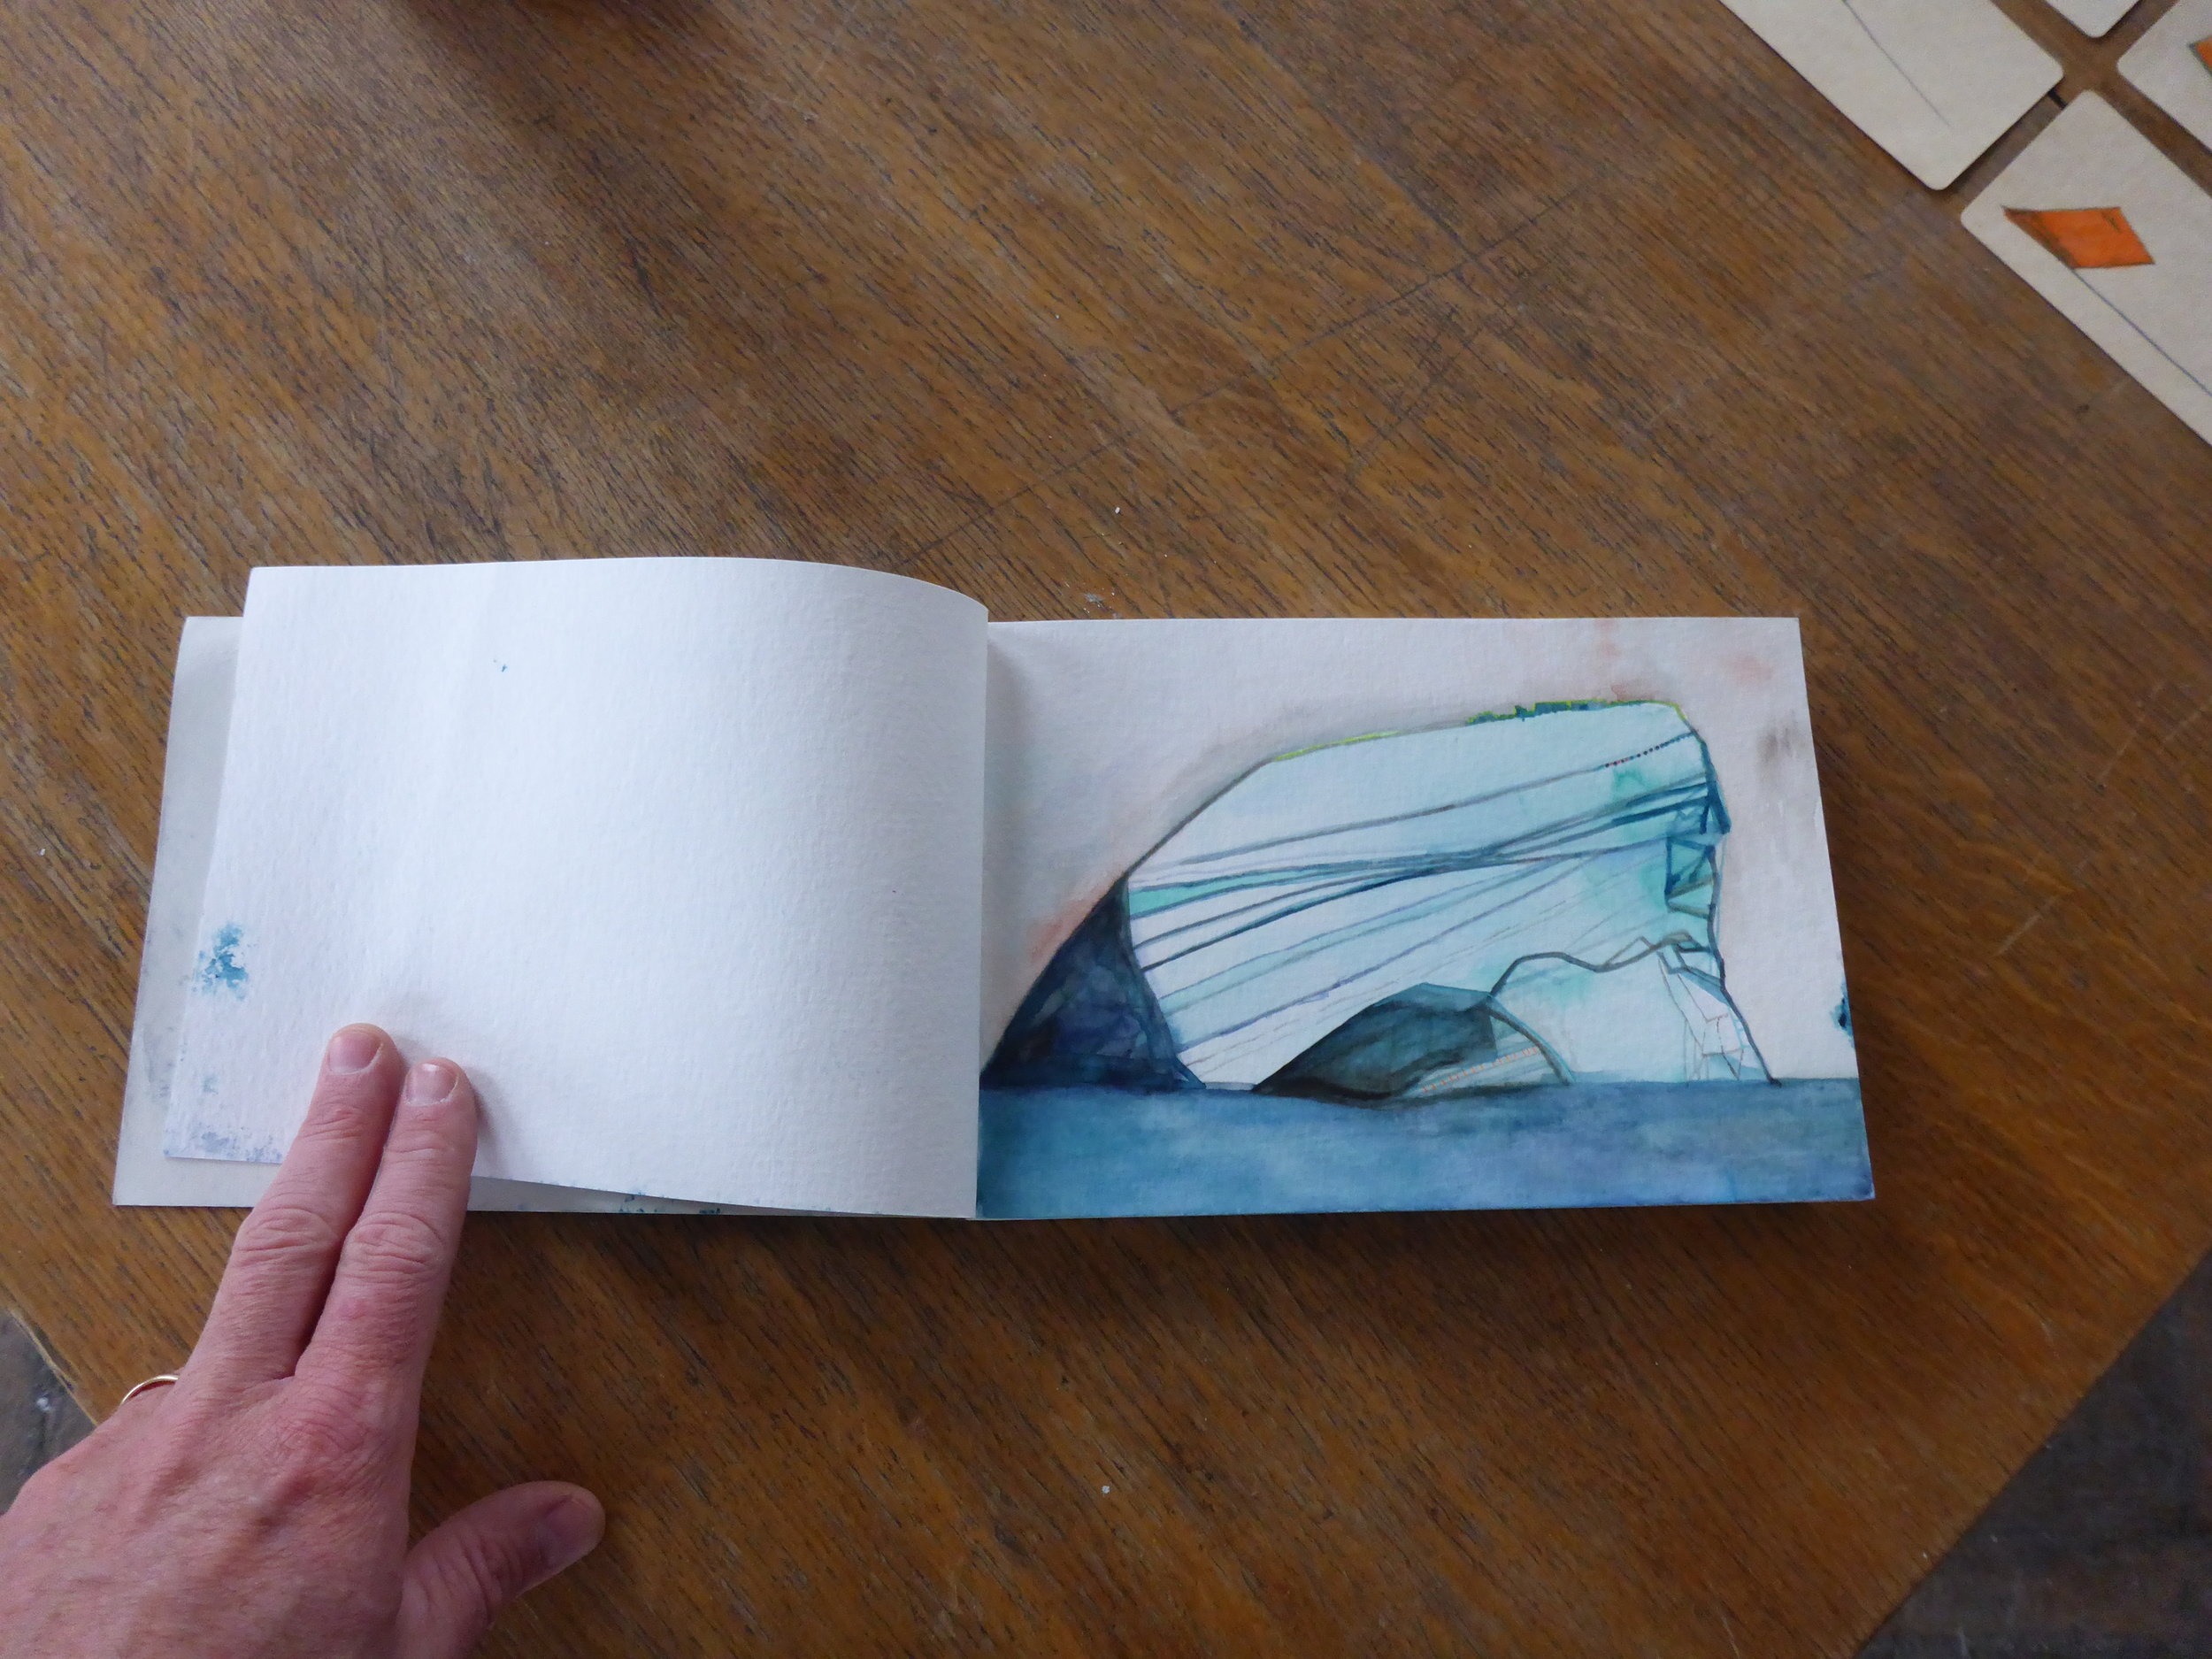 Annie Ewaskio Watercolor on paper,Pyramiden Canteen, Svalbard, Norway, July 2016